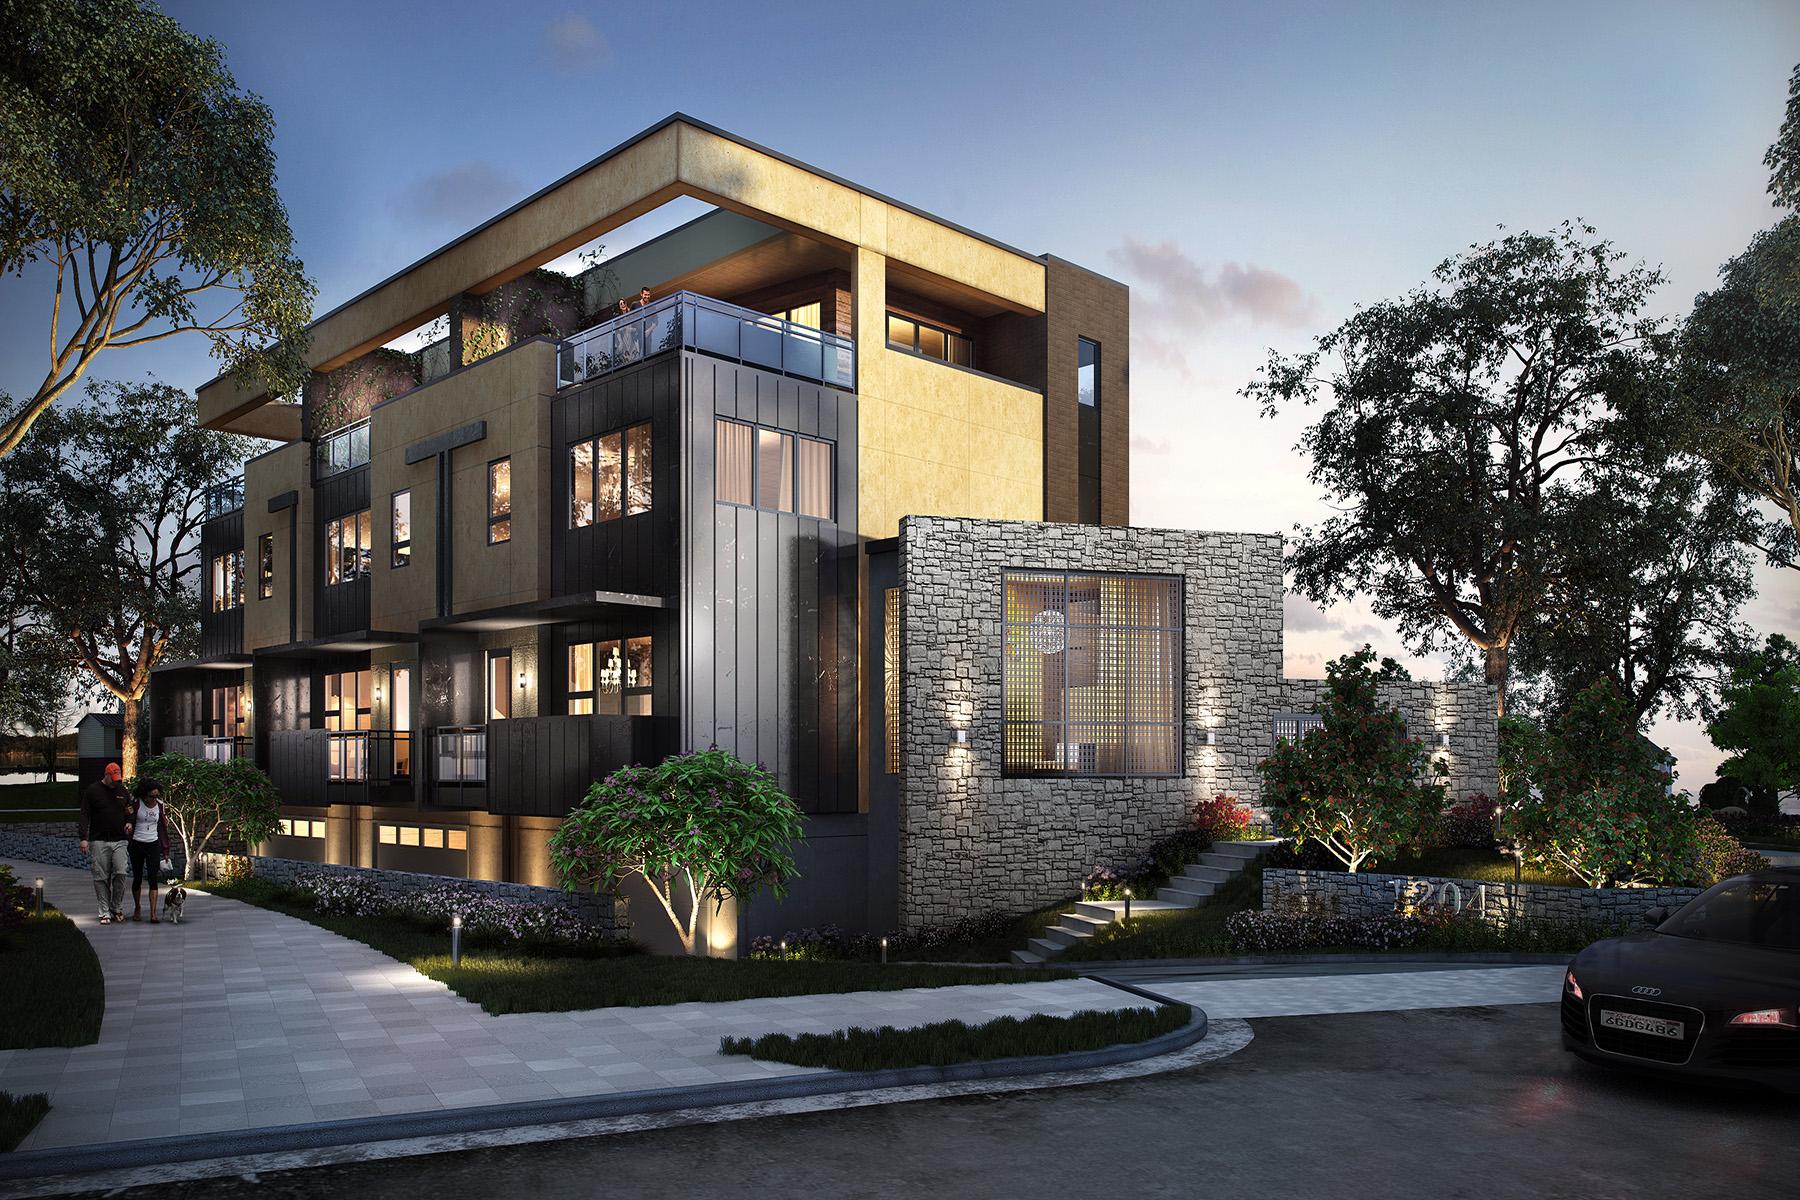 townhouses için Satış at Three Ultra Luxury Town-homes In Ansley Park 1204 Piedmont Avenue NE NO. 3, Atlanta, Georgia 30309 Amerika Birleşik Devletleri